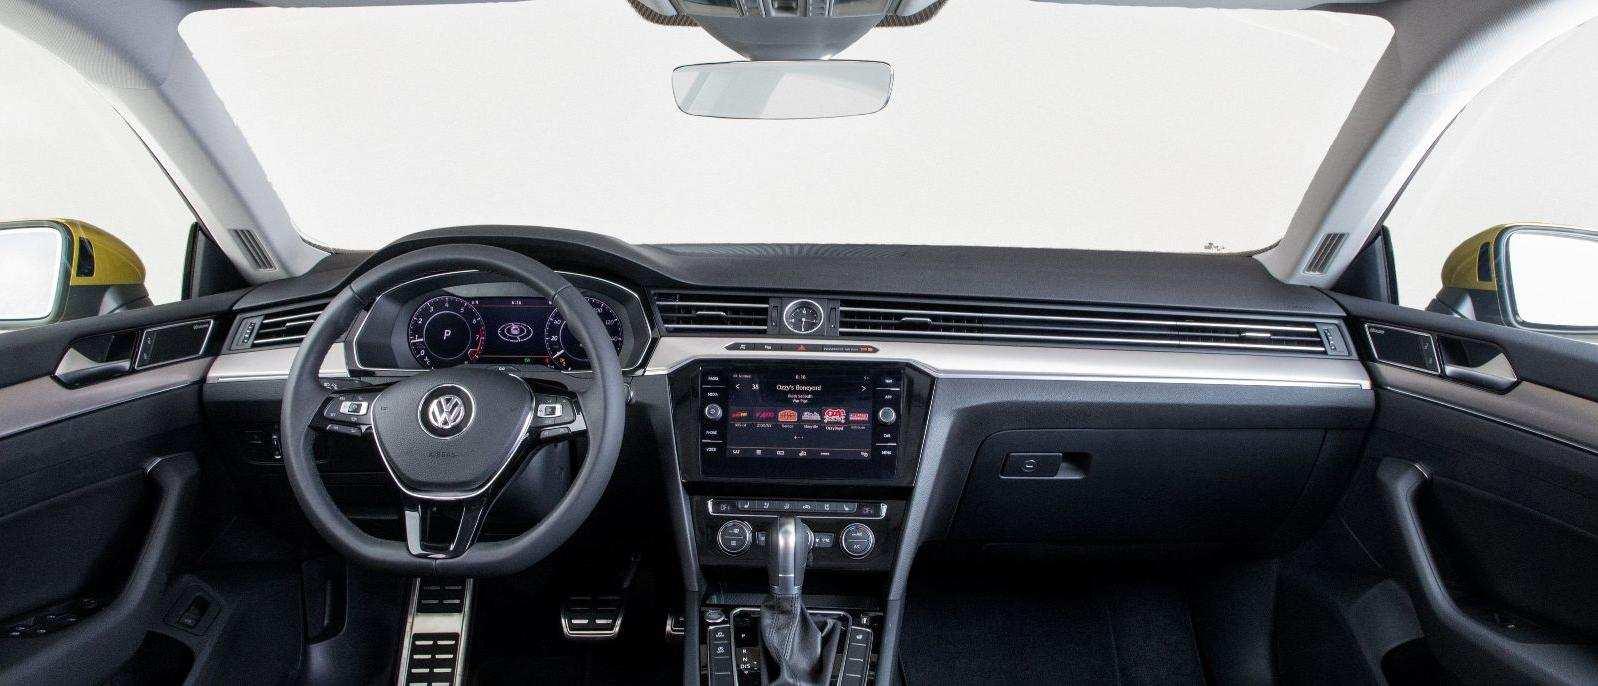 17 Gallery of New Volkswagen Sedan 2019 Interior Wallpaper by New Volkswagen Sedan 2019 Interior